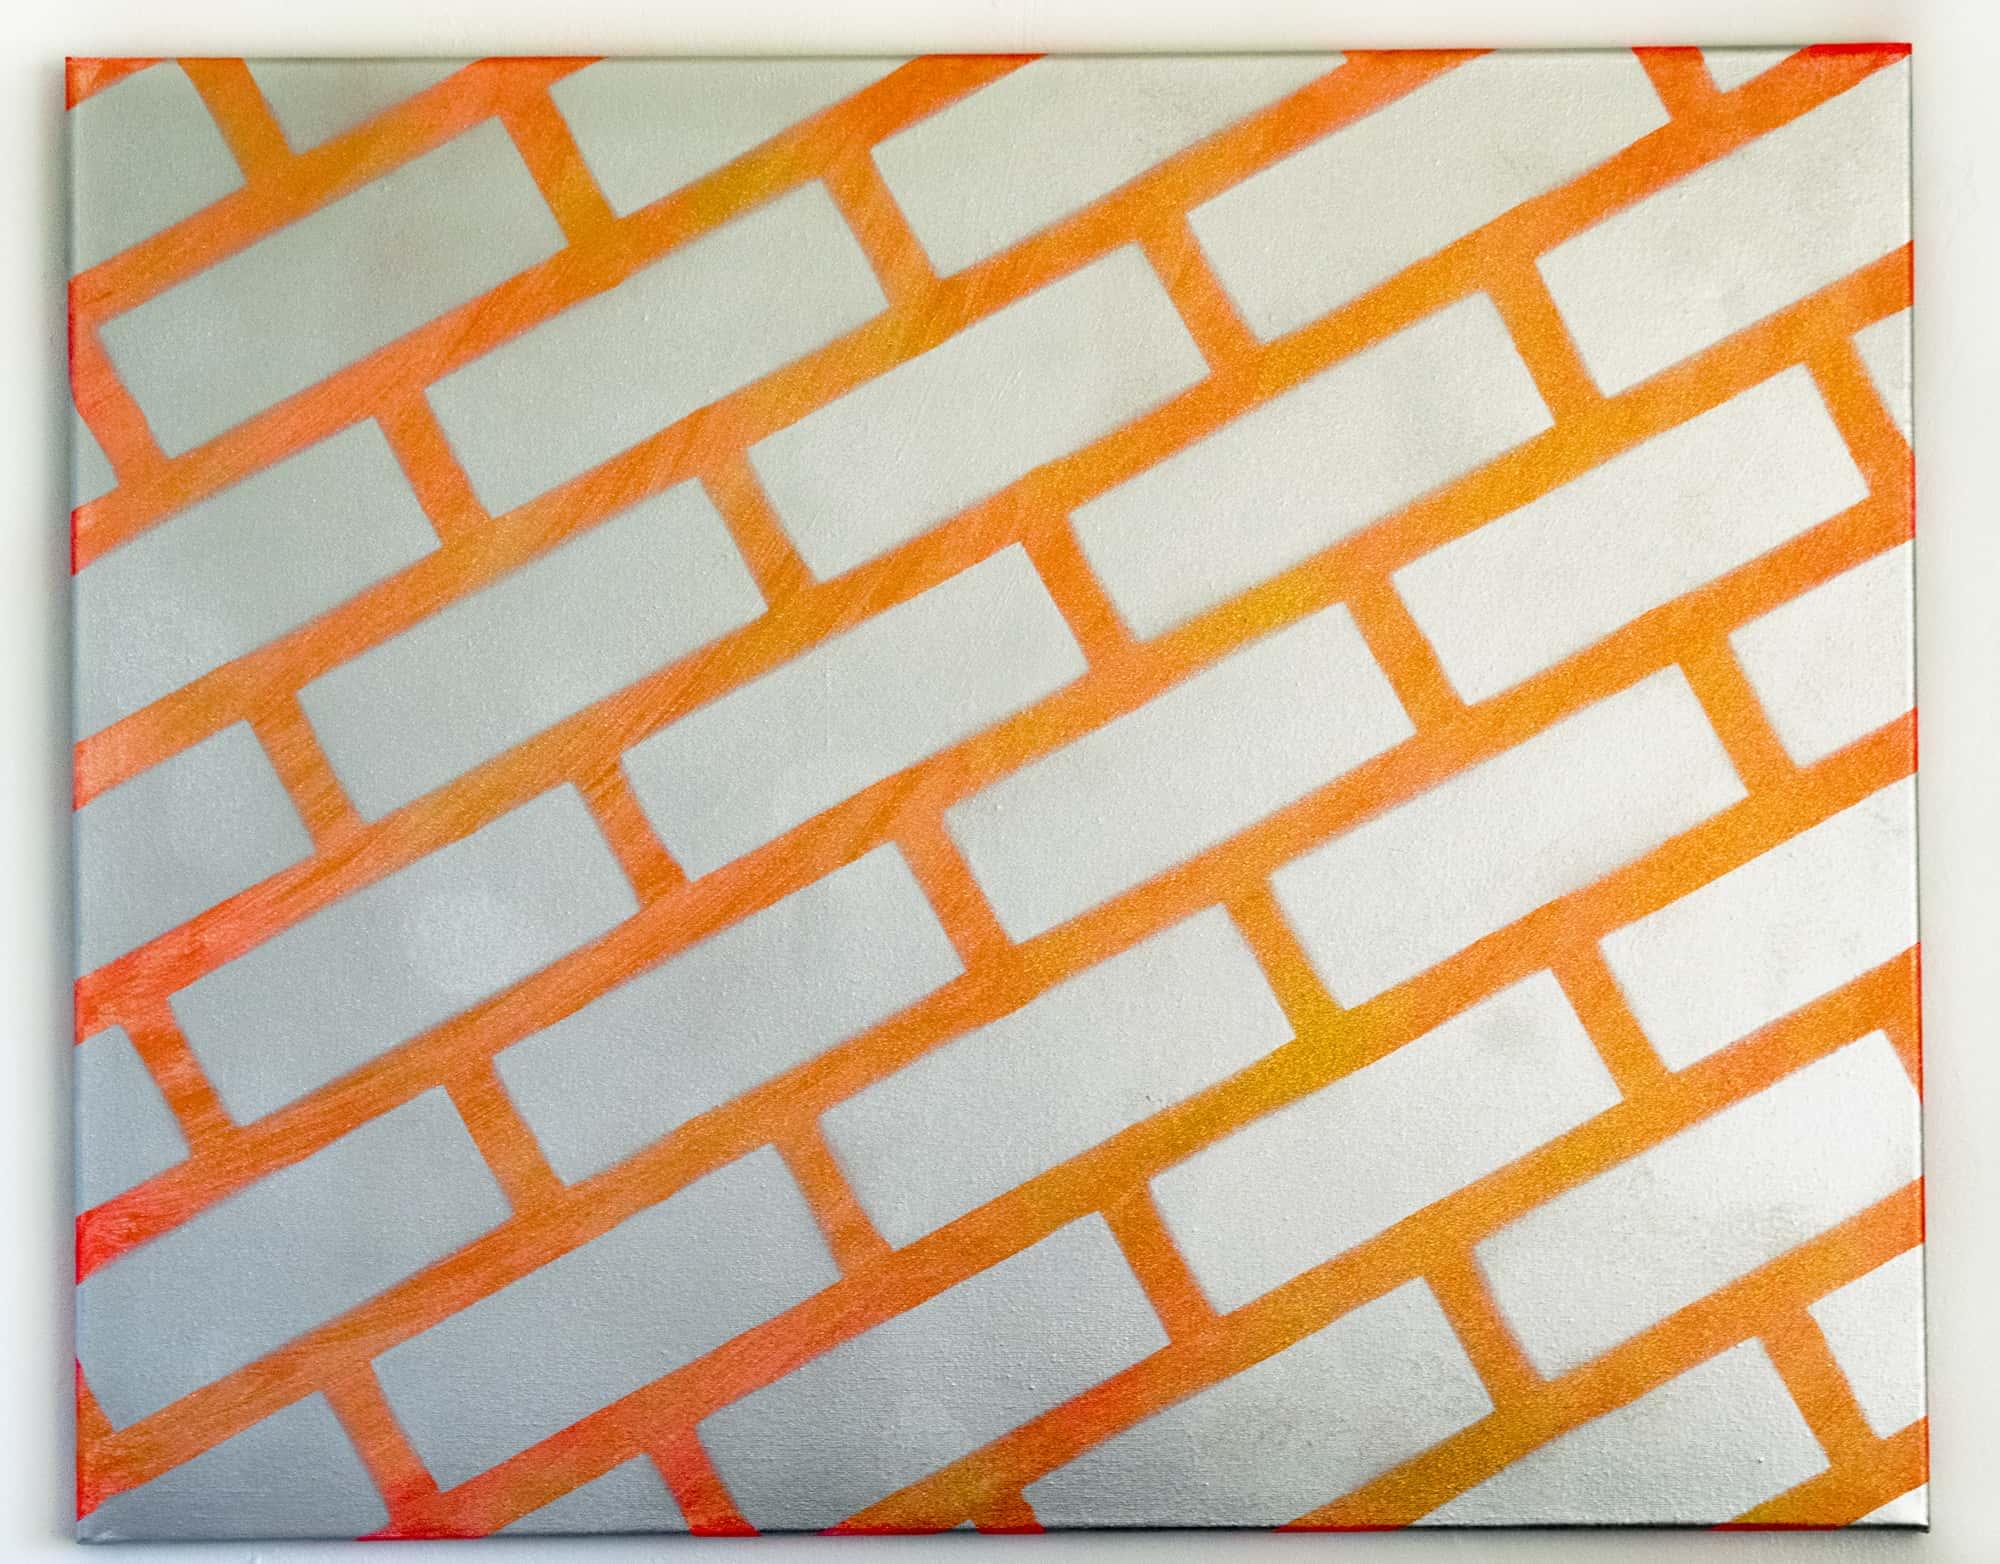 Kevin-Rudkin-MA-Fine-Art-University -of-Sunderland-Creatives